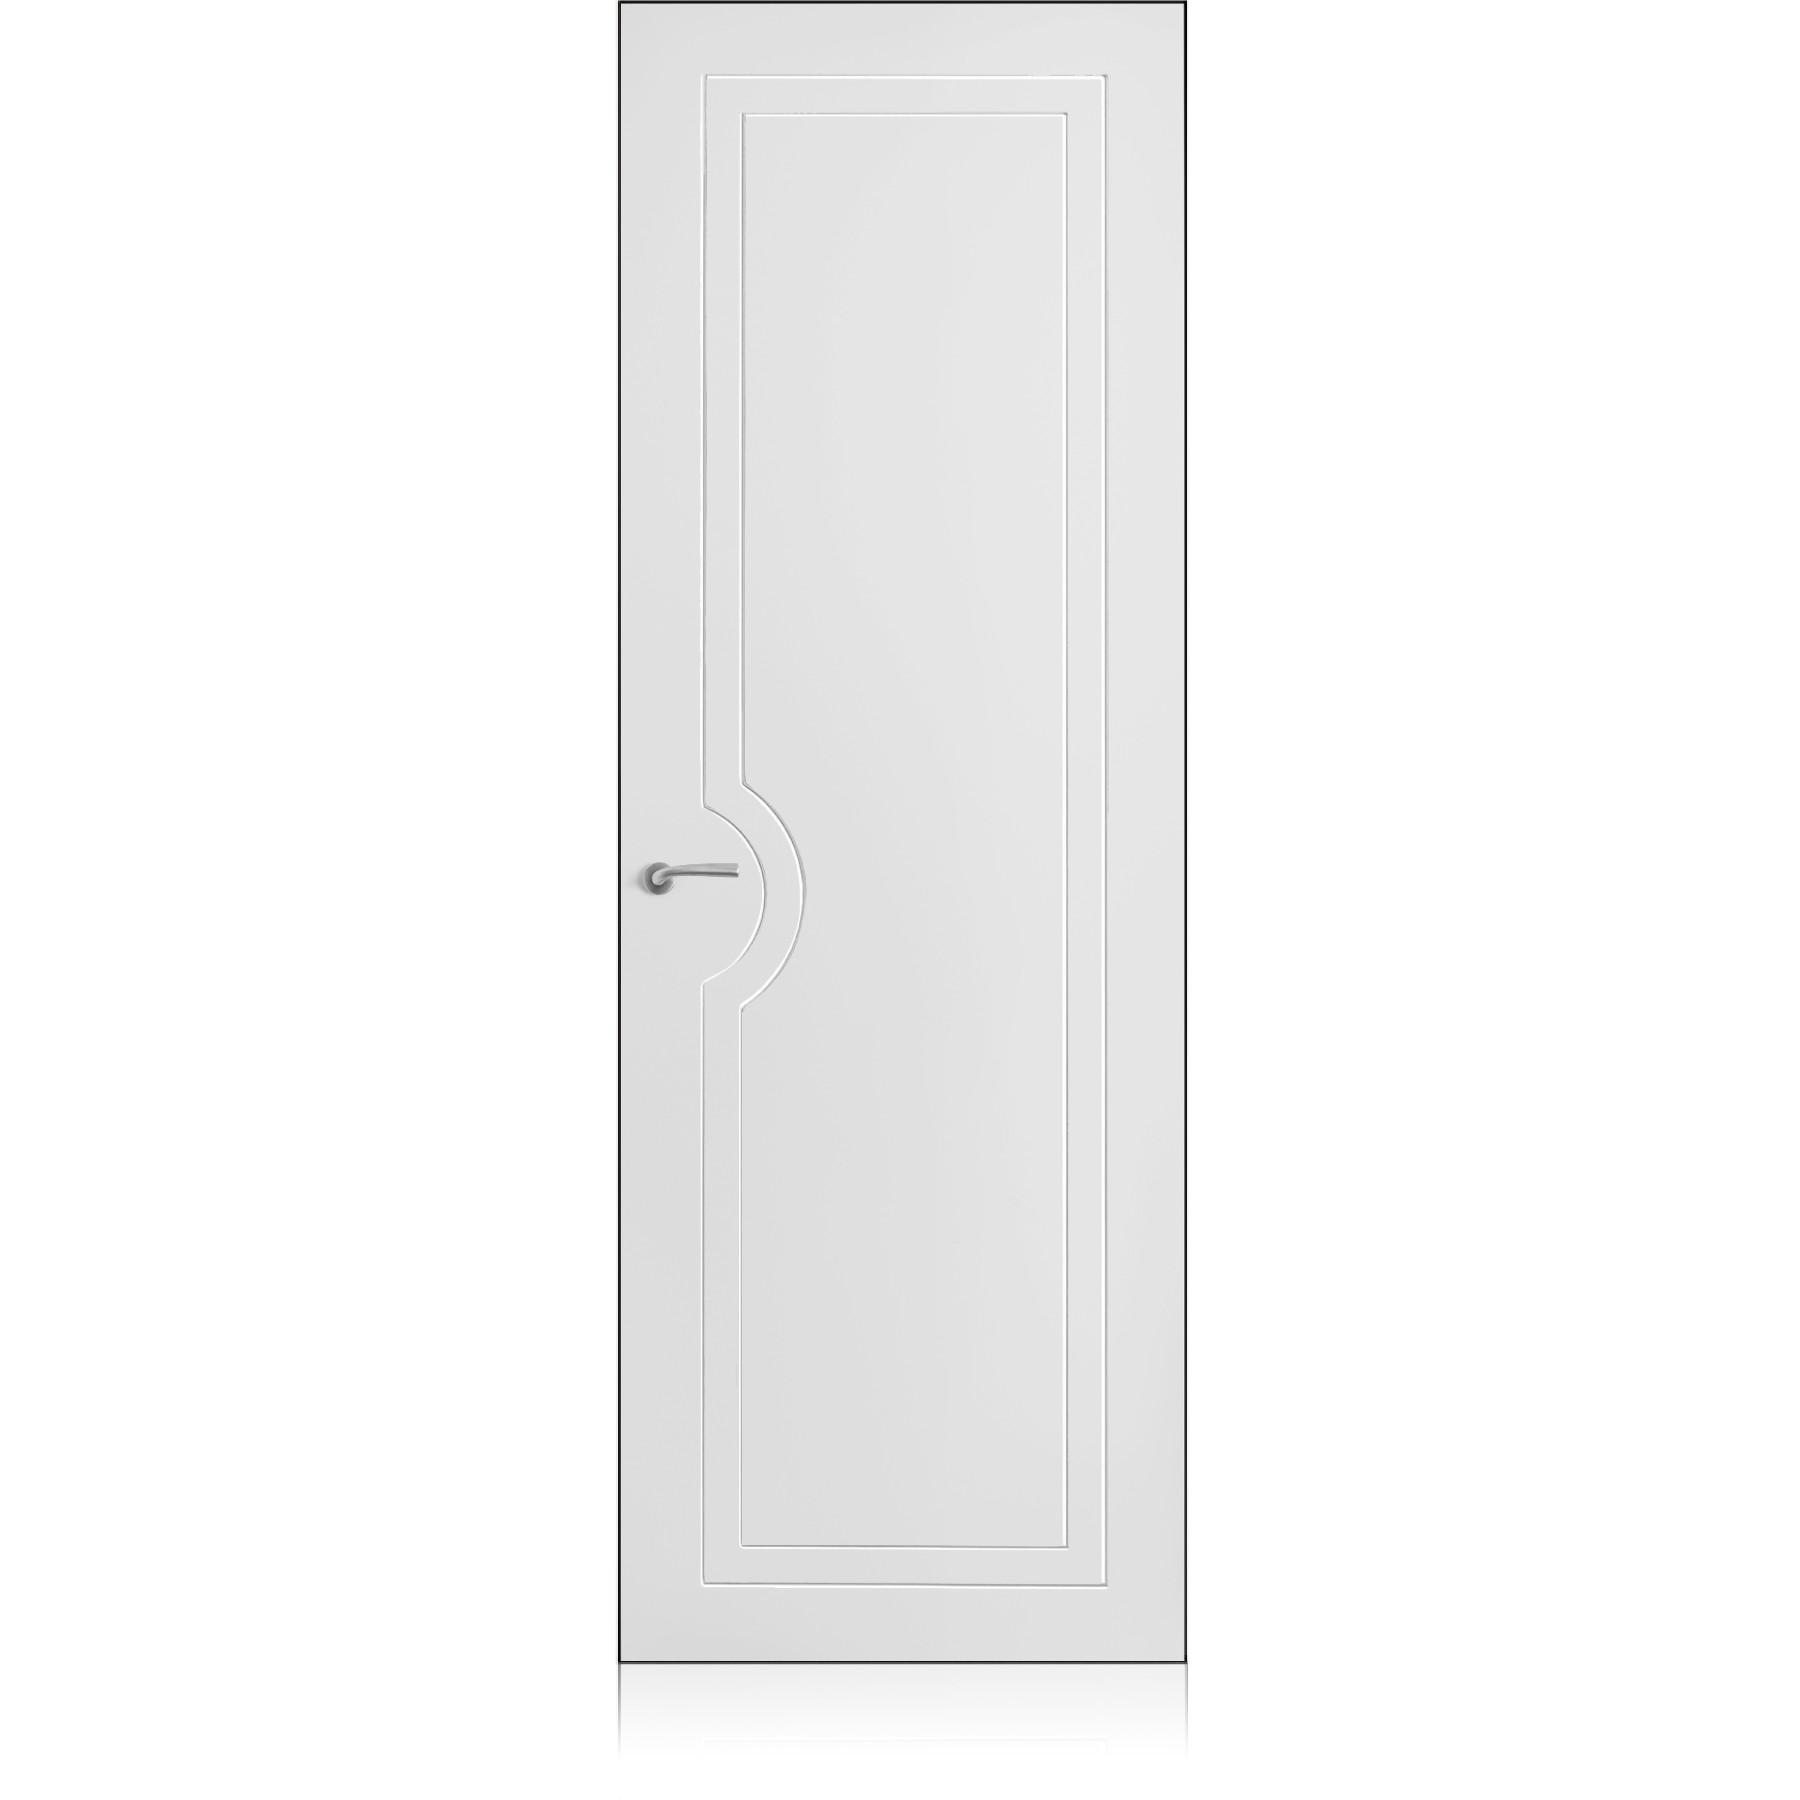 Yncisa/1 Zero bianco optical door